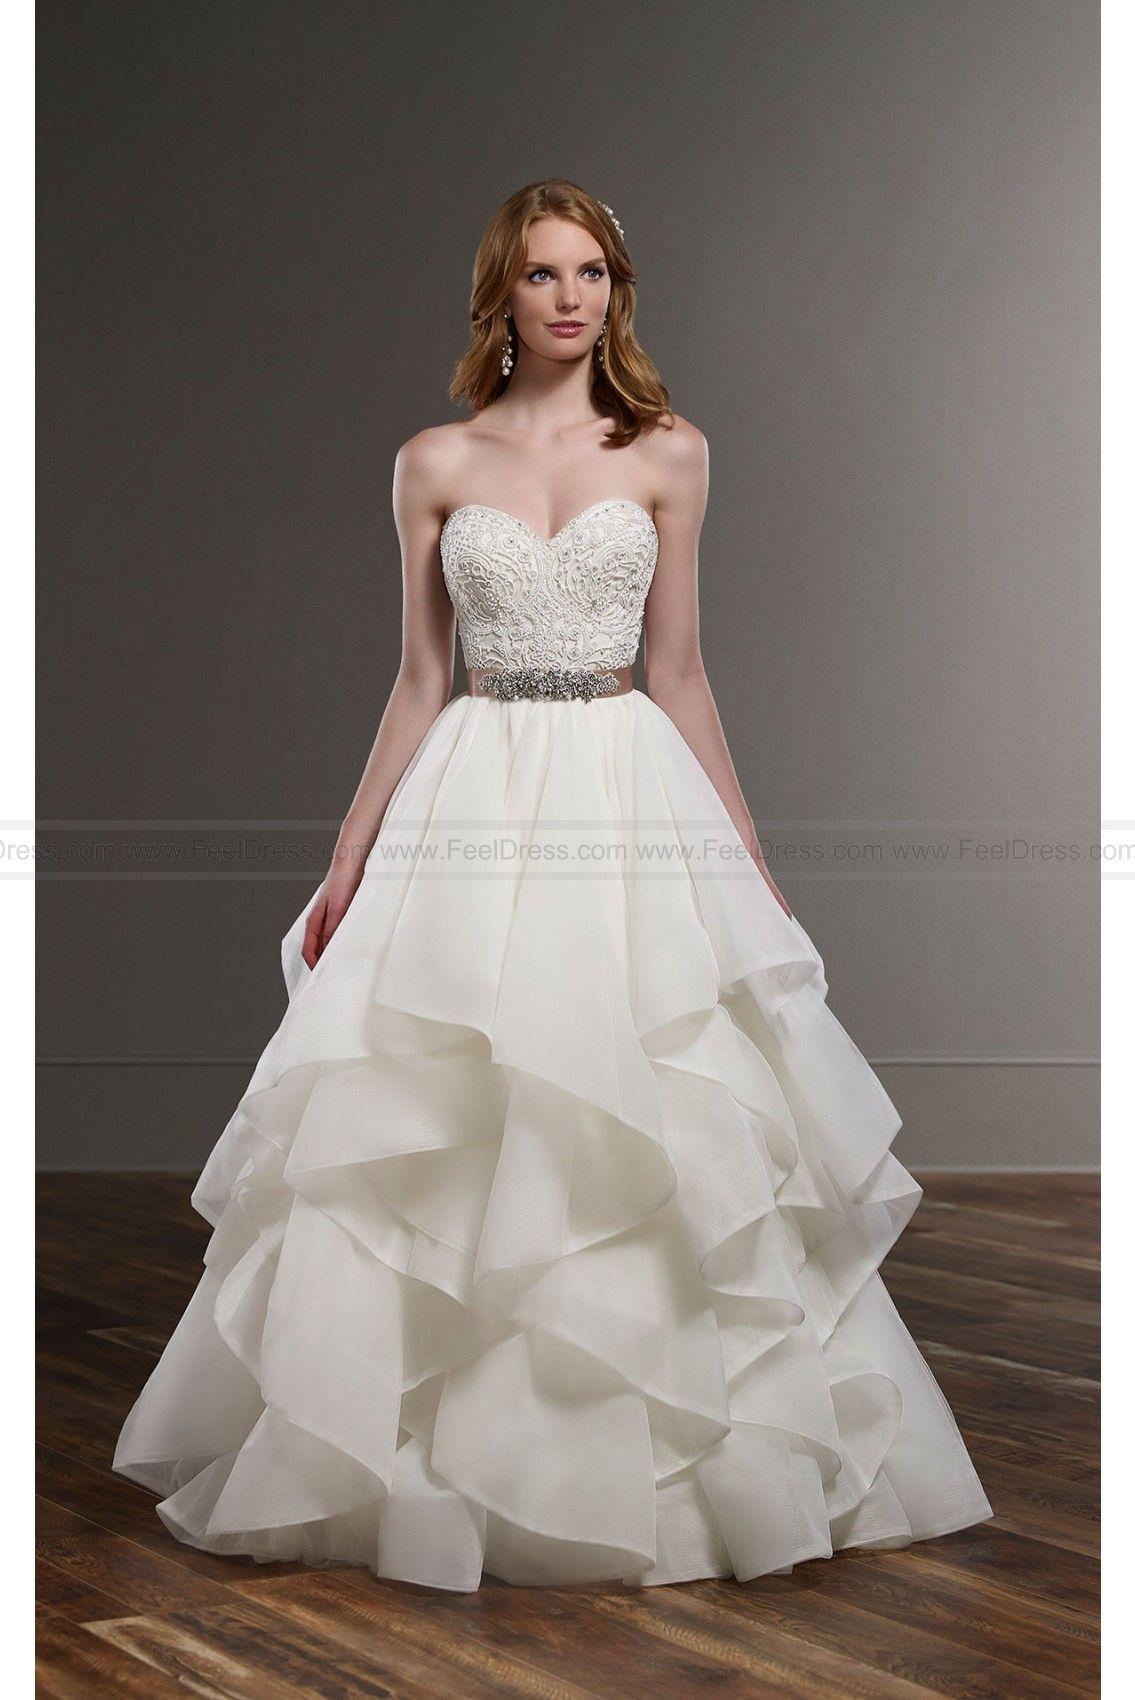 Martina Liana Separates Wedding Gown Style CARYS+STEVIE